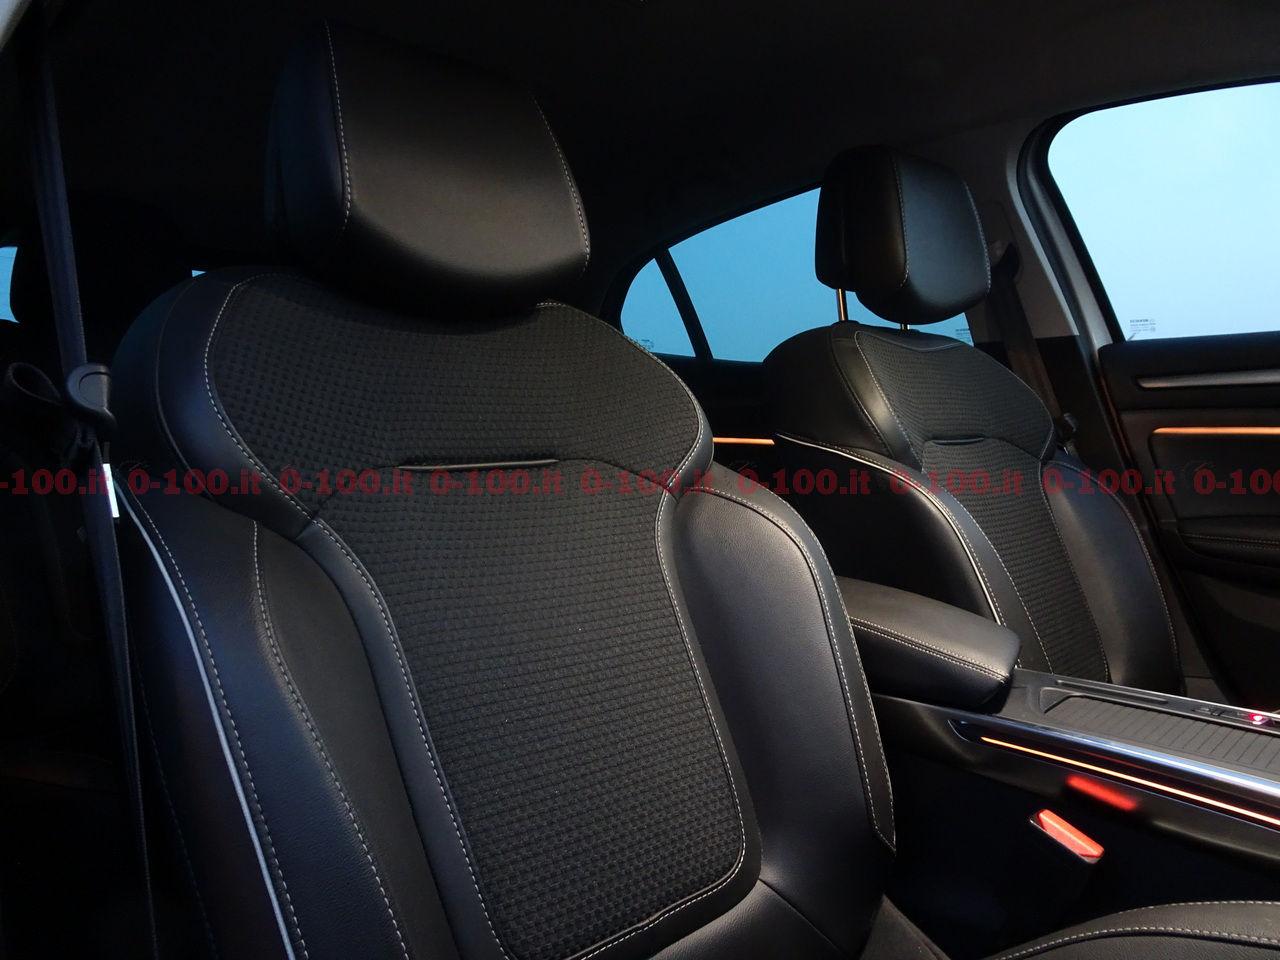 Renault-Megane-GT-Bose-dCi-130-test-prova-opinioni_0-100_34